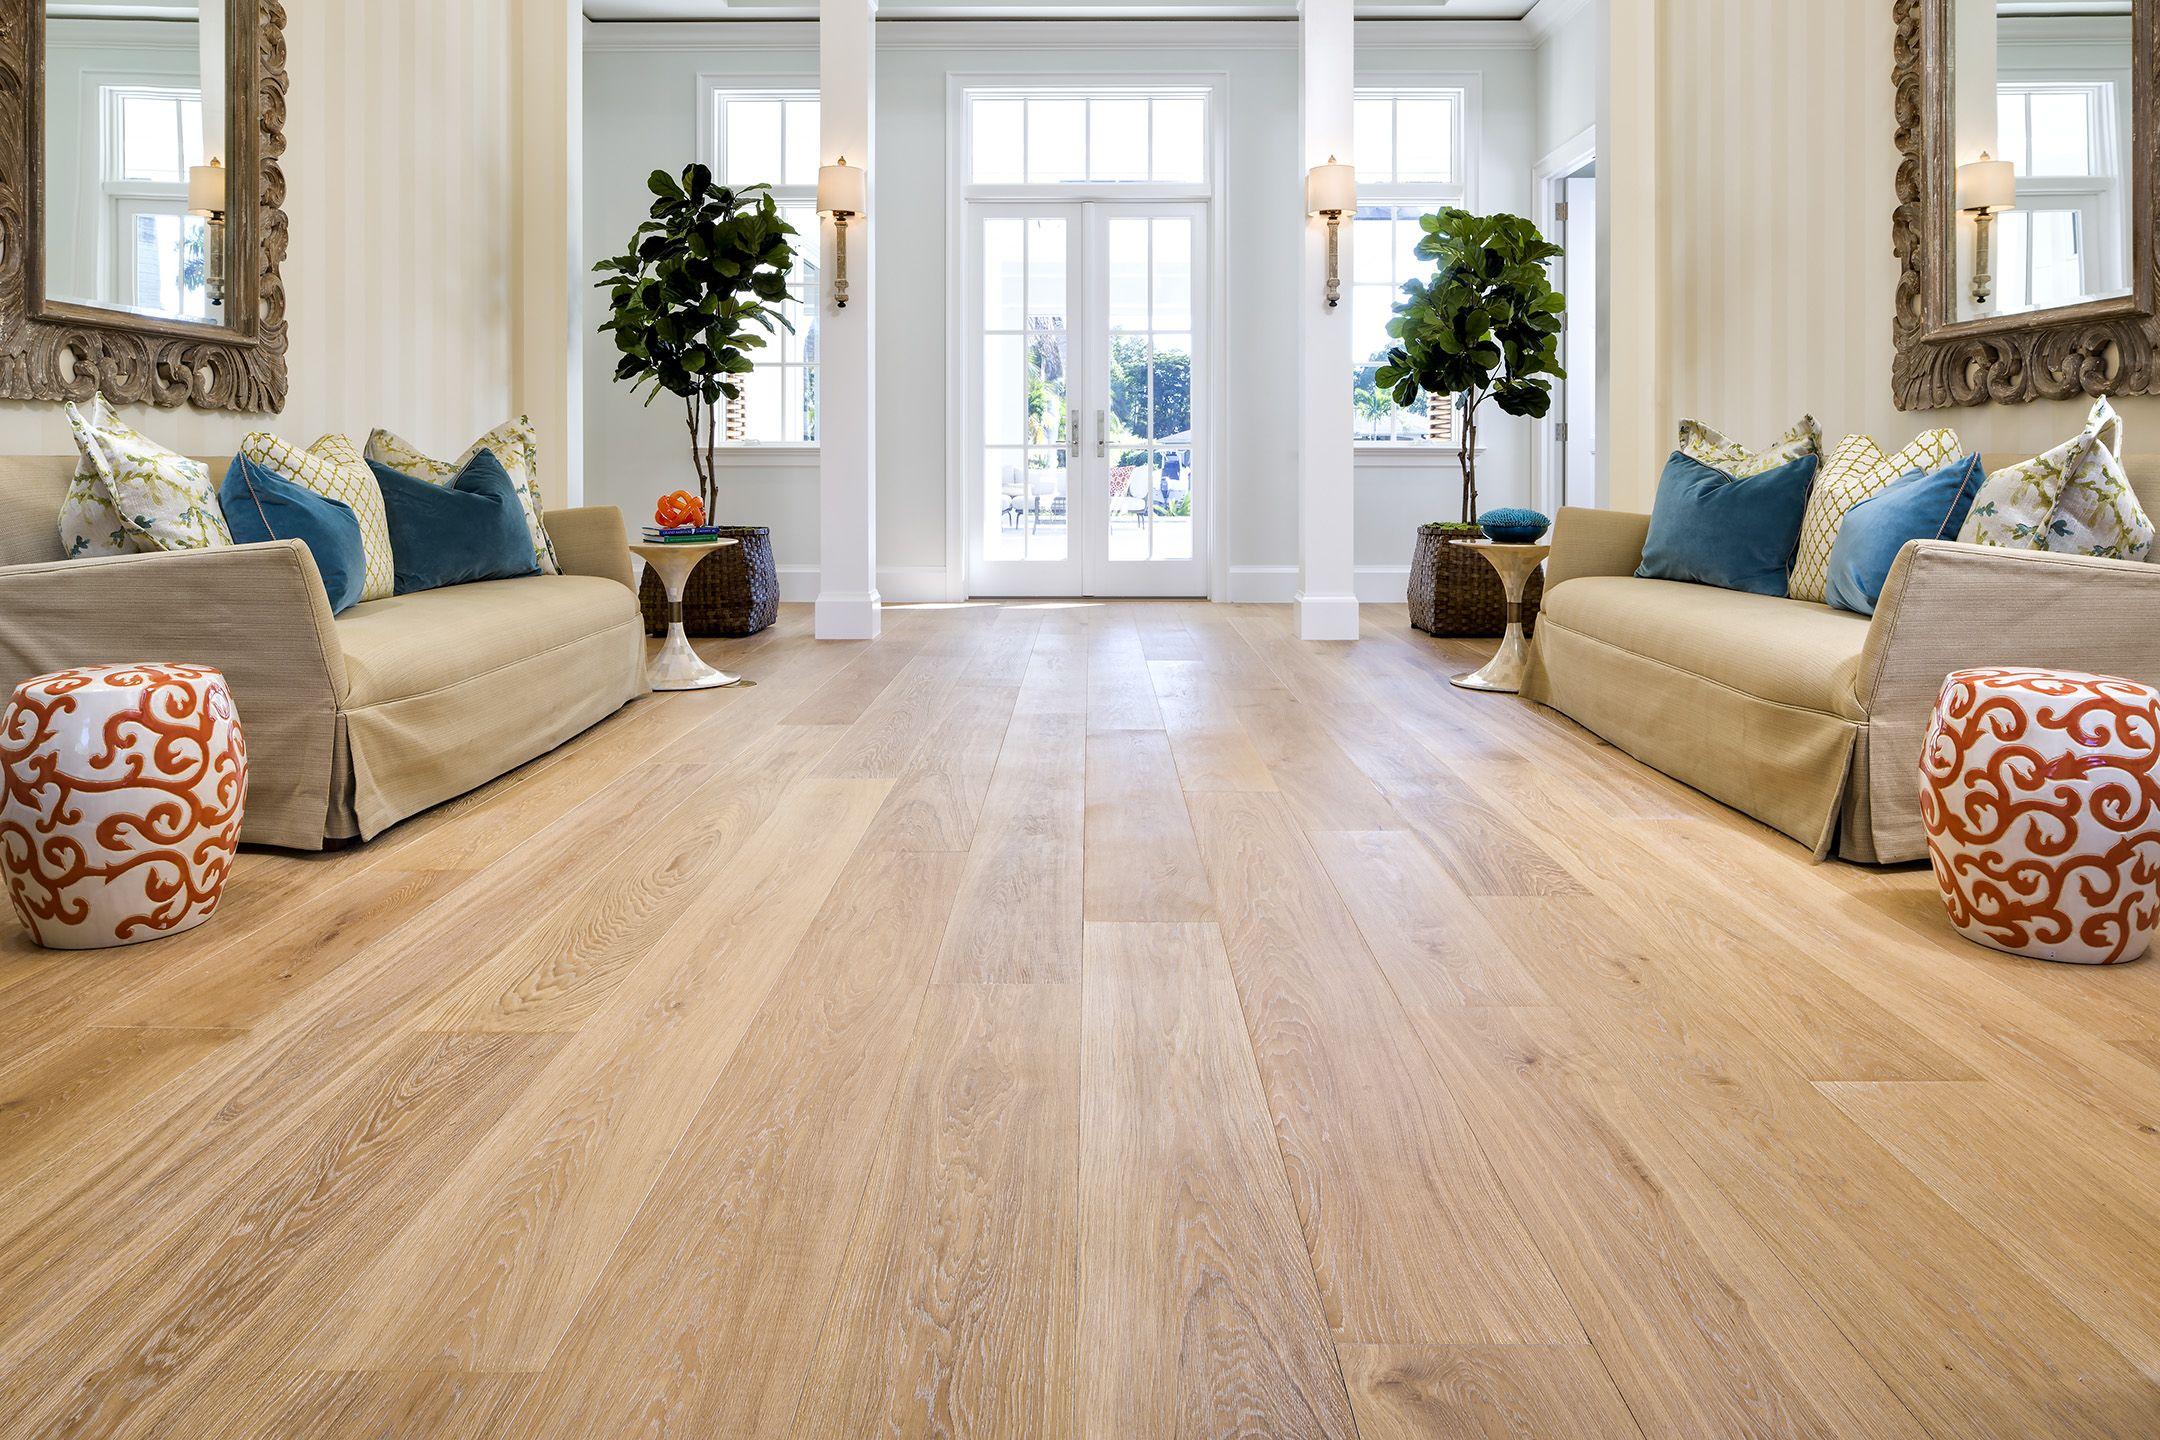 Wide Plank Flooring Custom Designed European Handcrafted